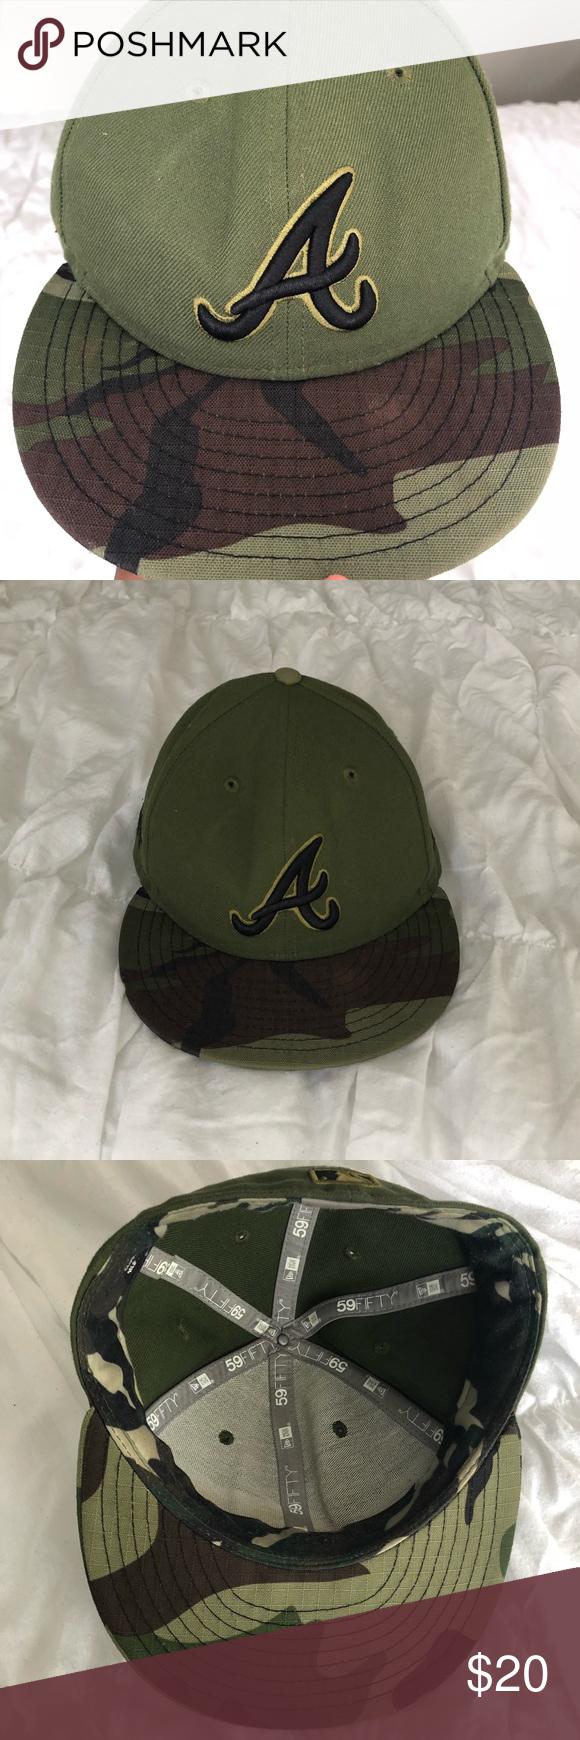 Atlanta Braves Baseball Hat Atlanta Braves Baseball Atlanta Braves Hat Atlanta Braves